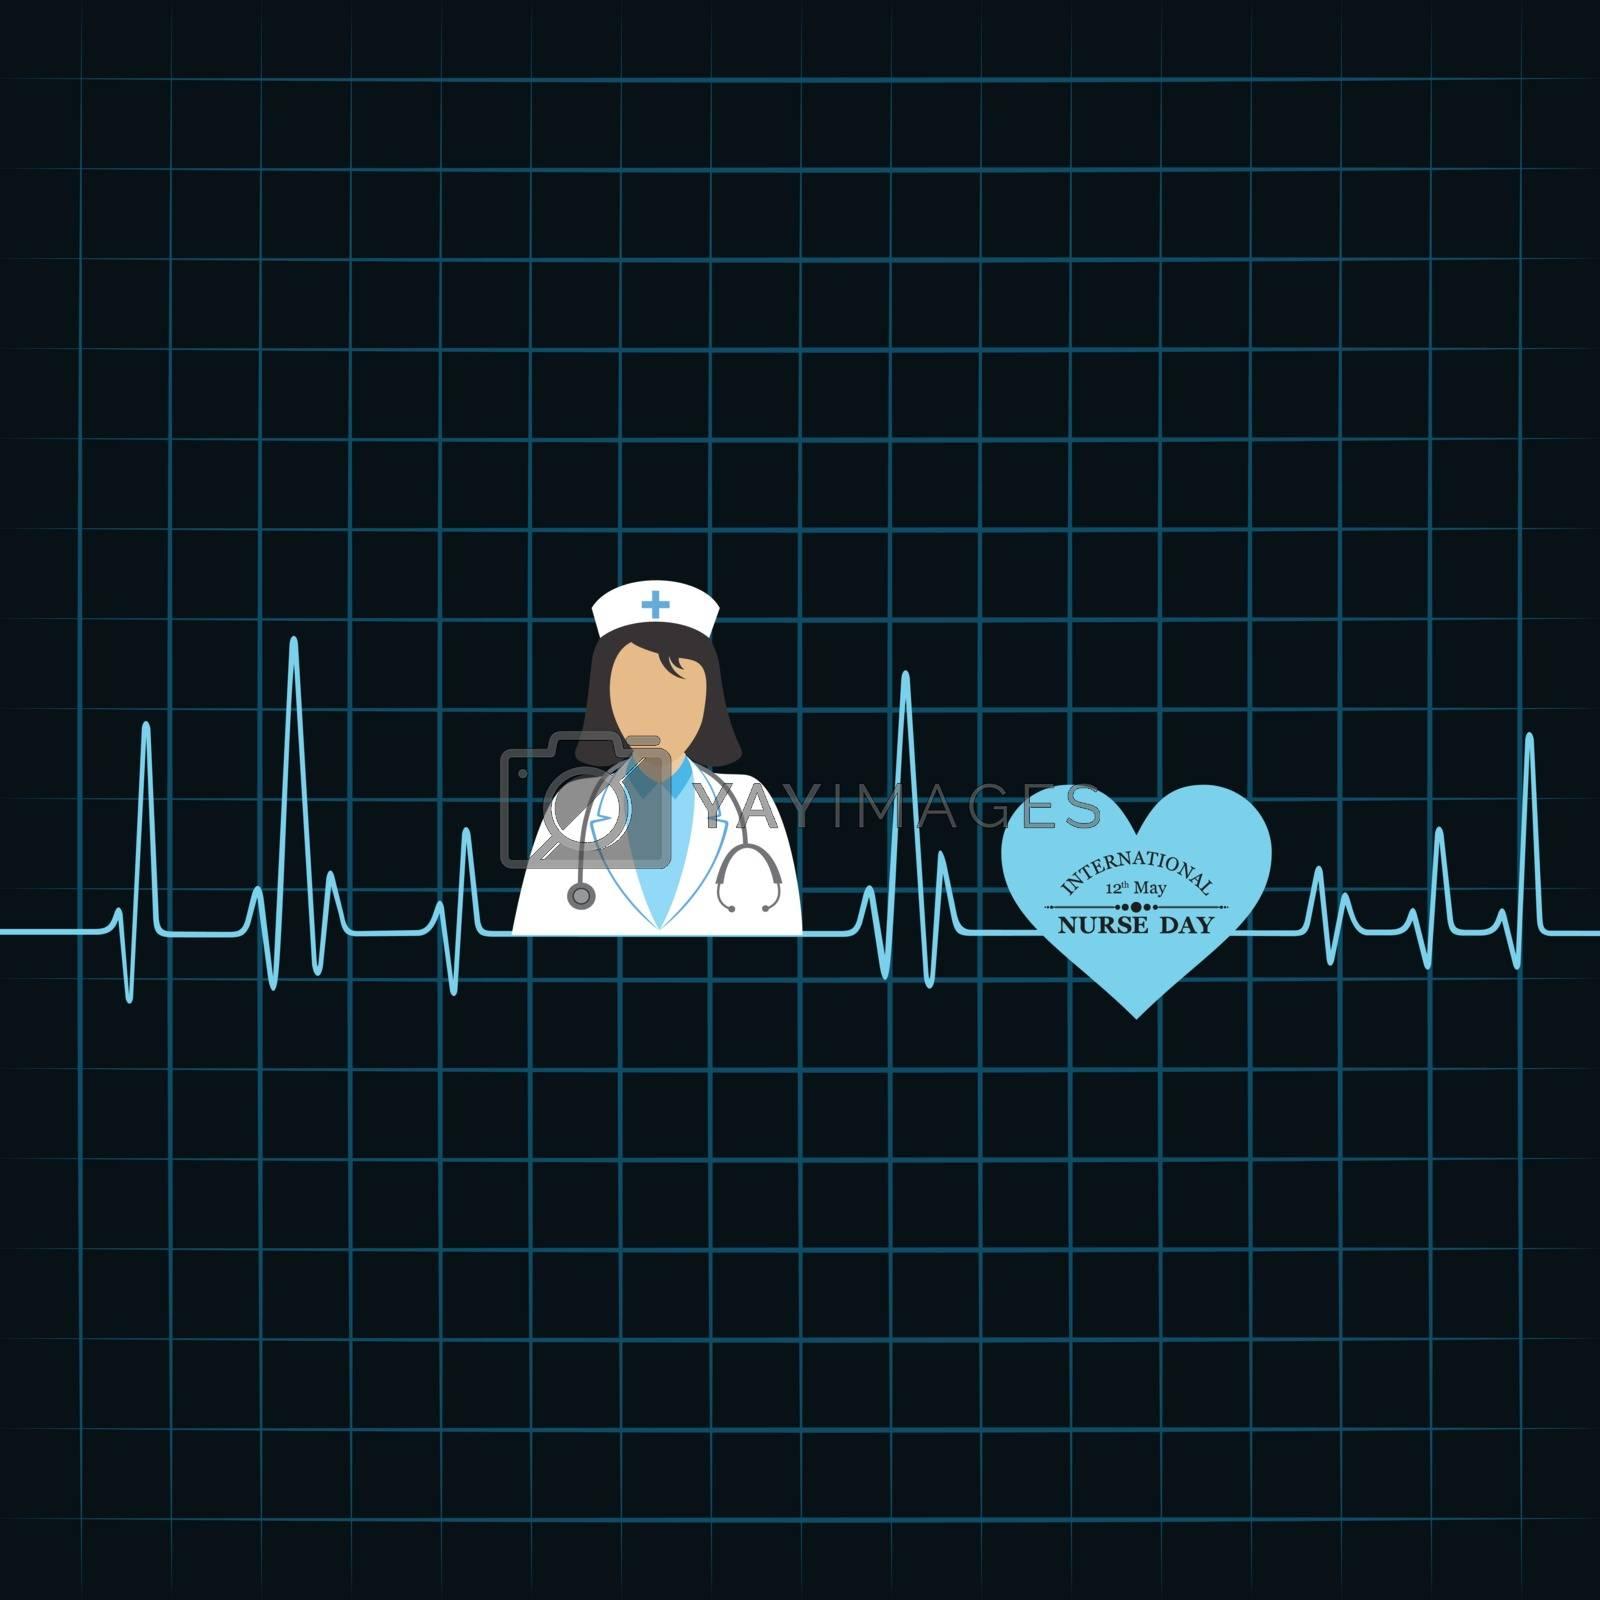 Vector illustration of International Nurse Day stock image and symbols